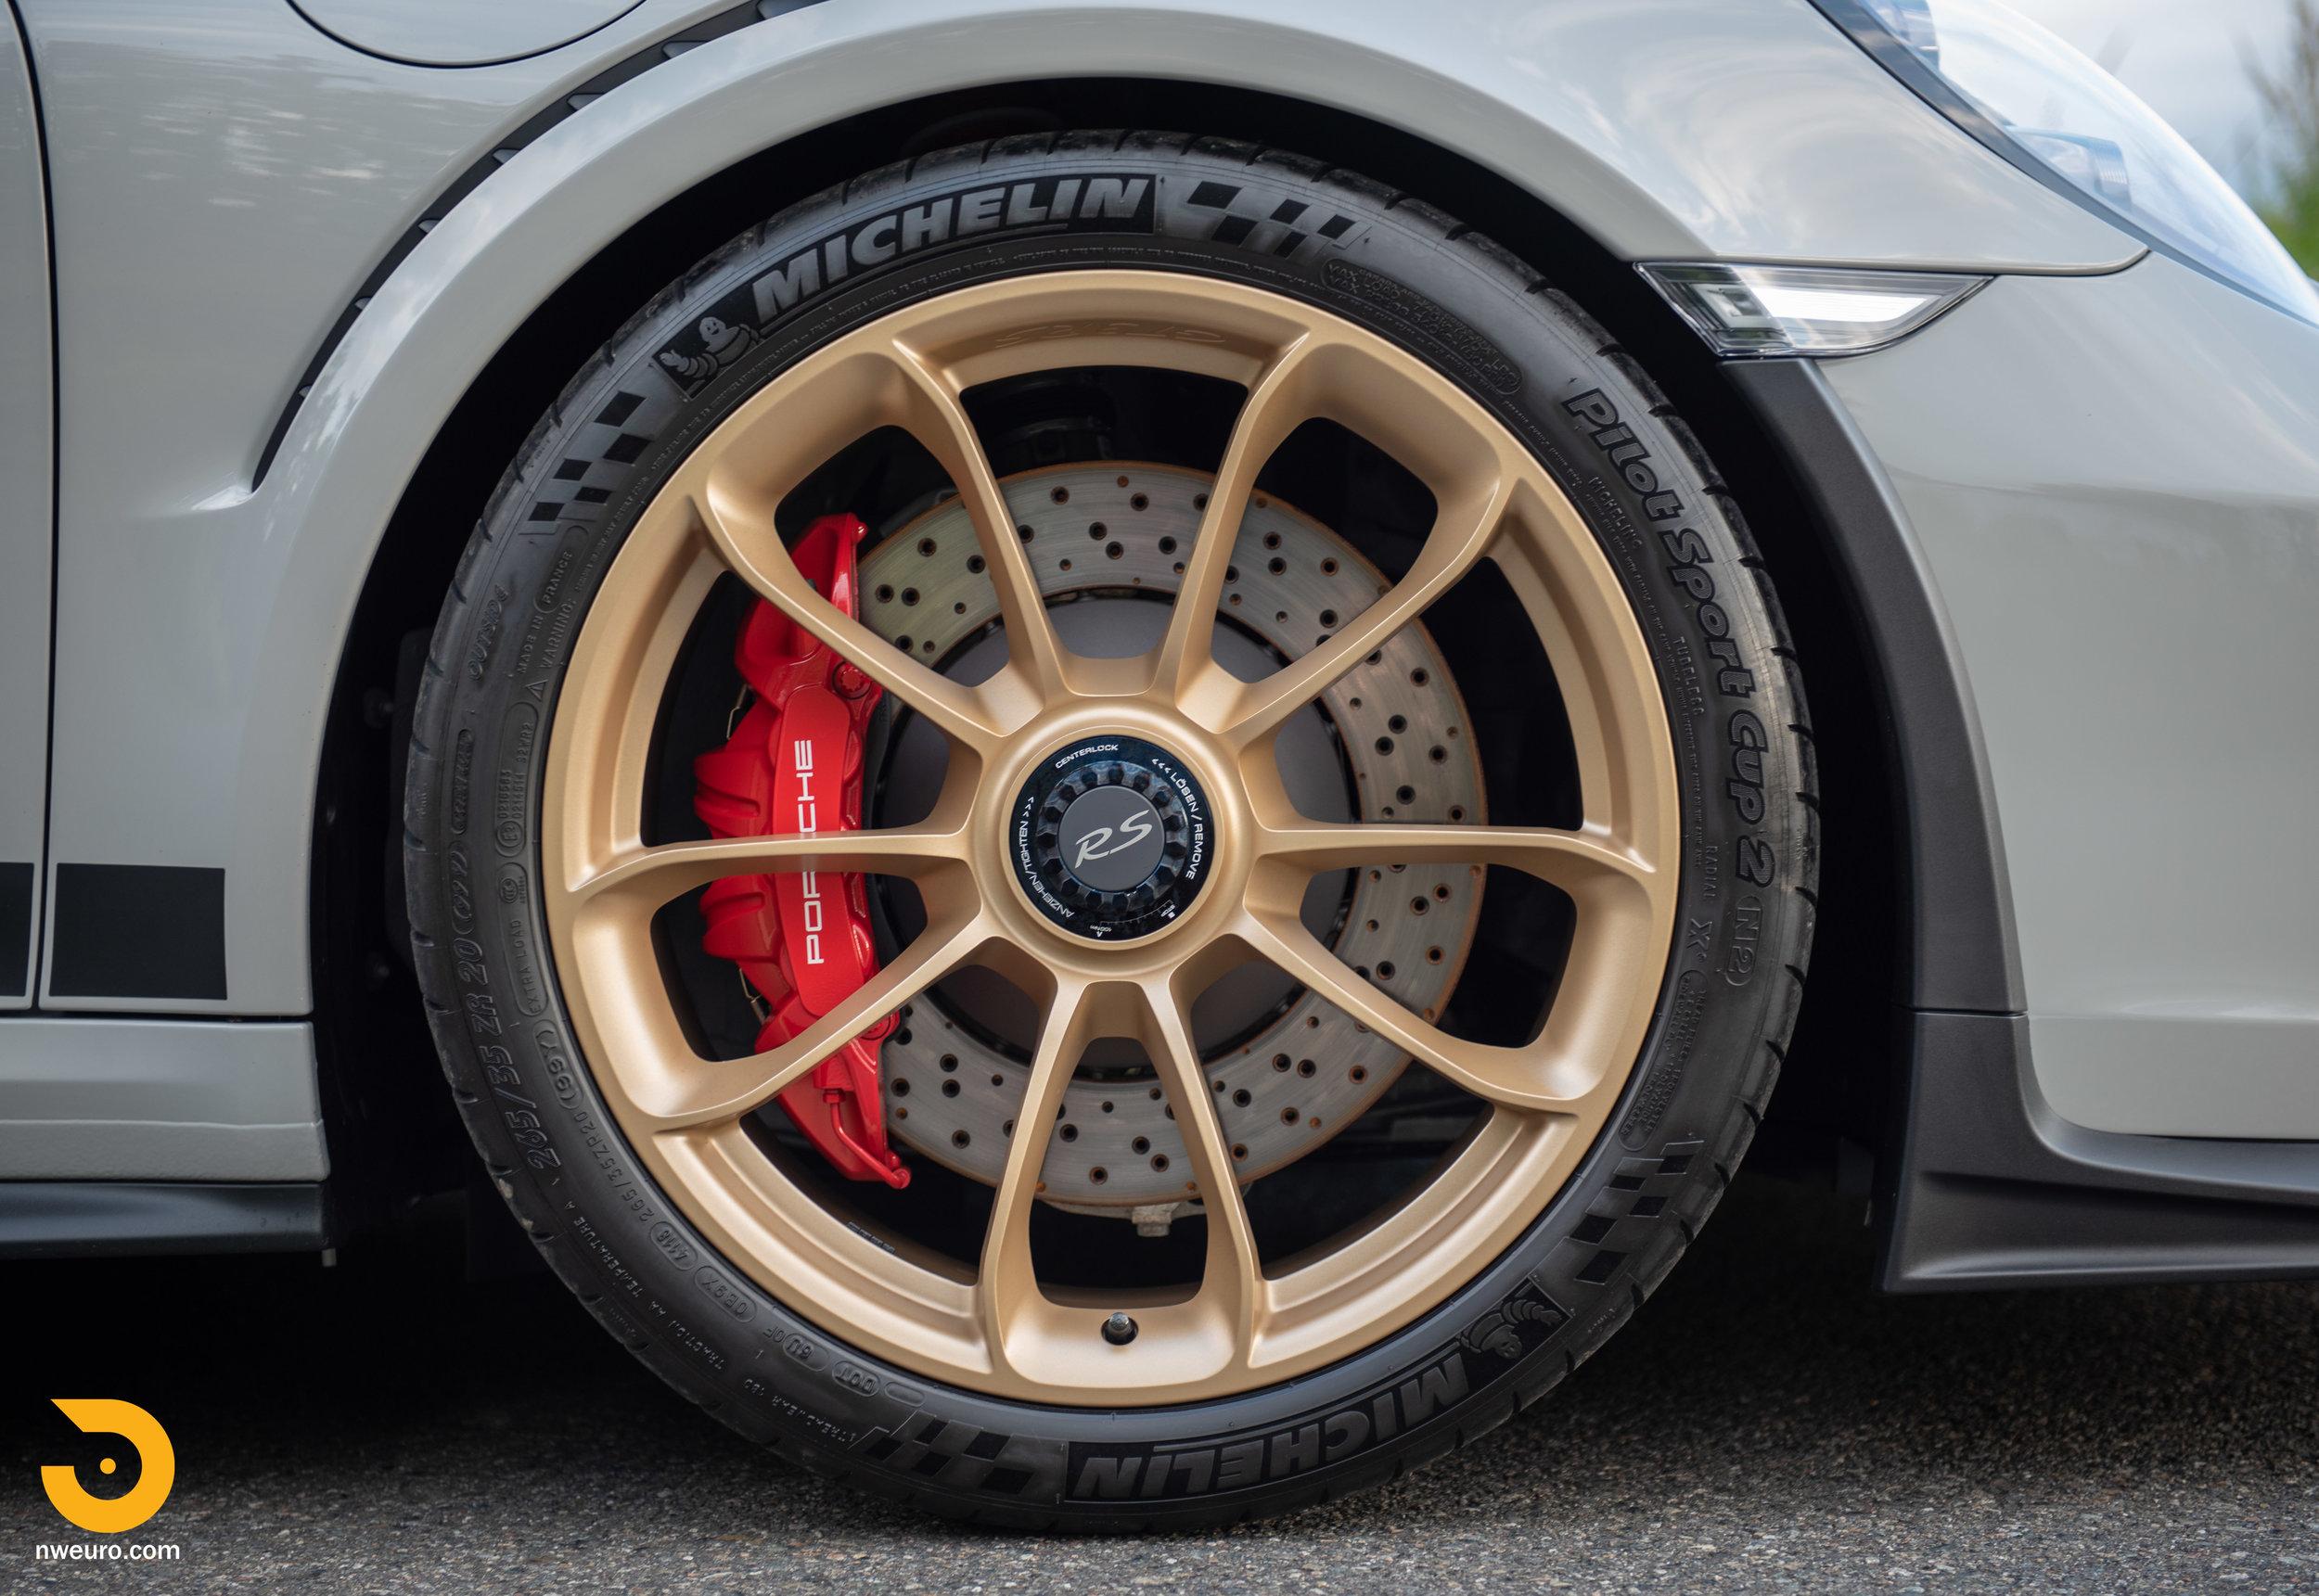 2019 Porsche GT3 RS - Chalk-61.jpg